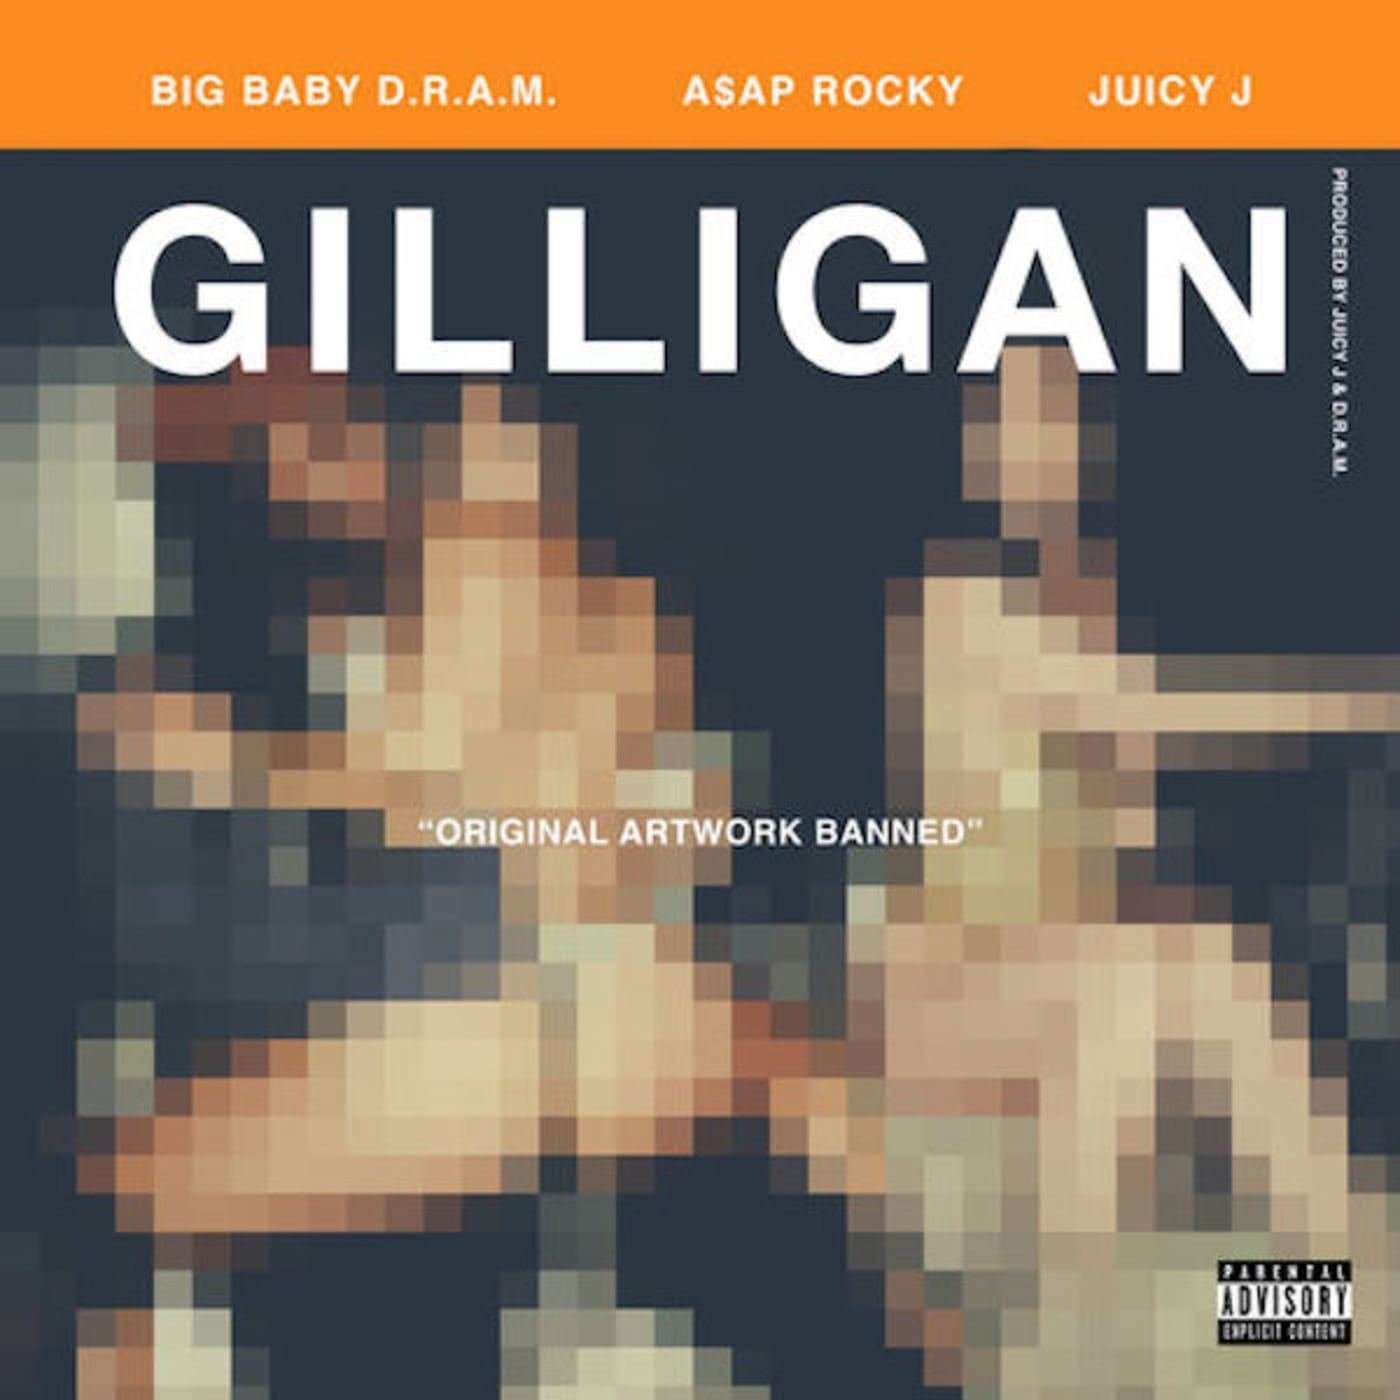 "D.R.A.M. ""Gilligan"" f/ ASAP Rocky and Juicy J"